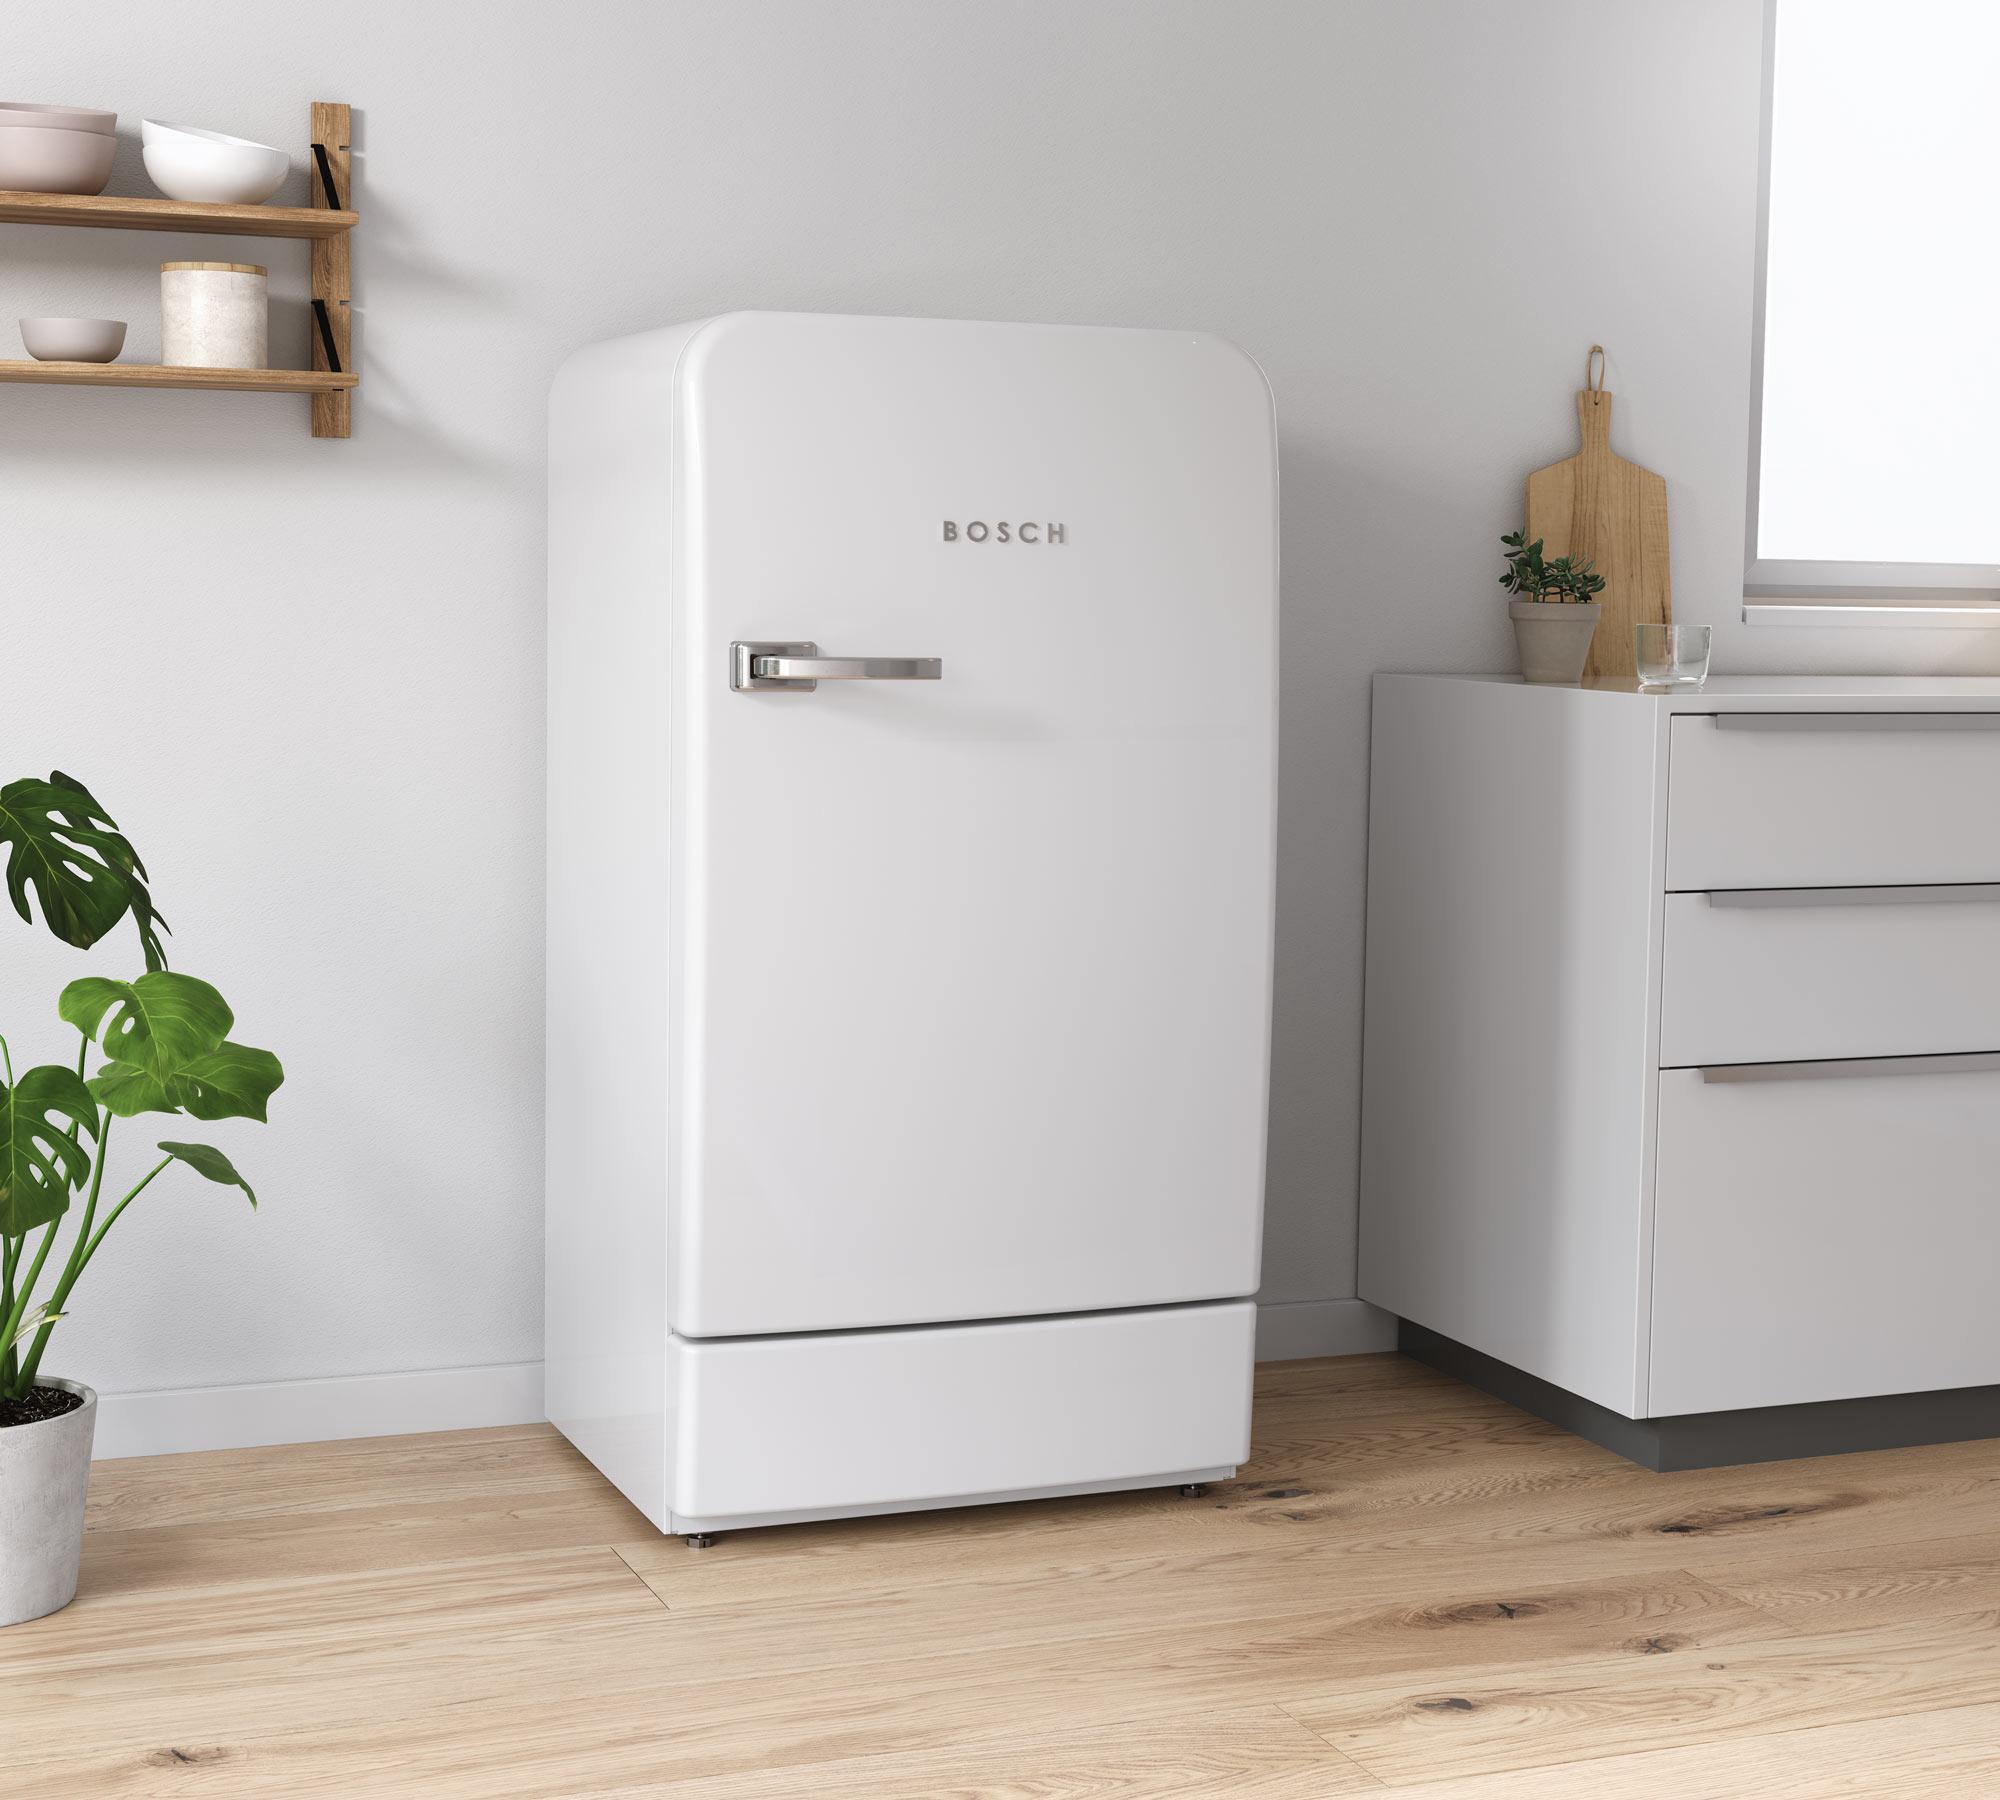 CGI - Bosch - Home Appliances - Fridges